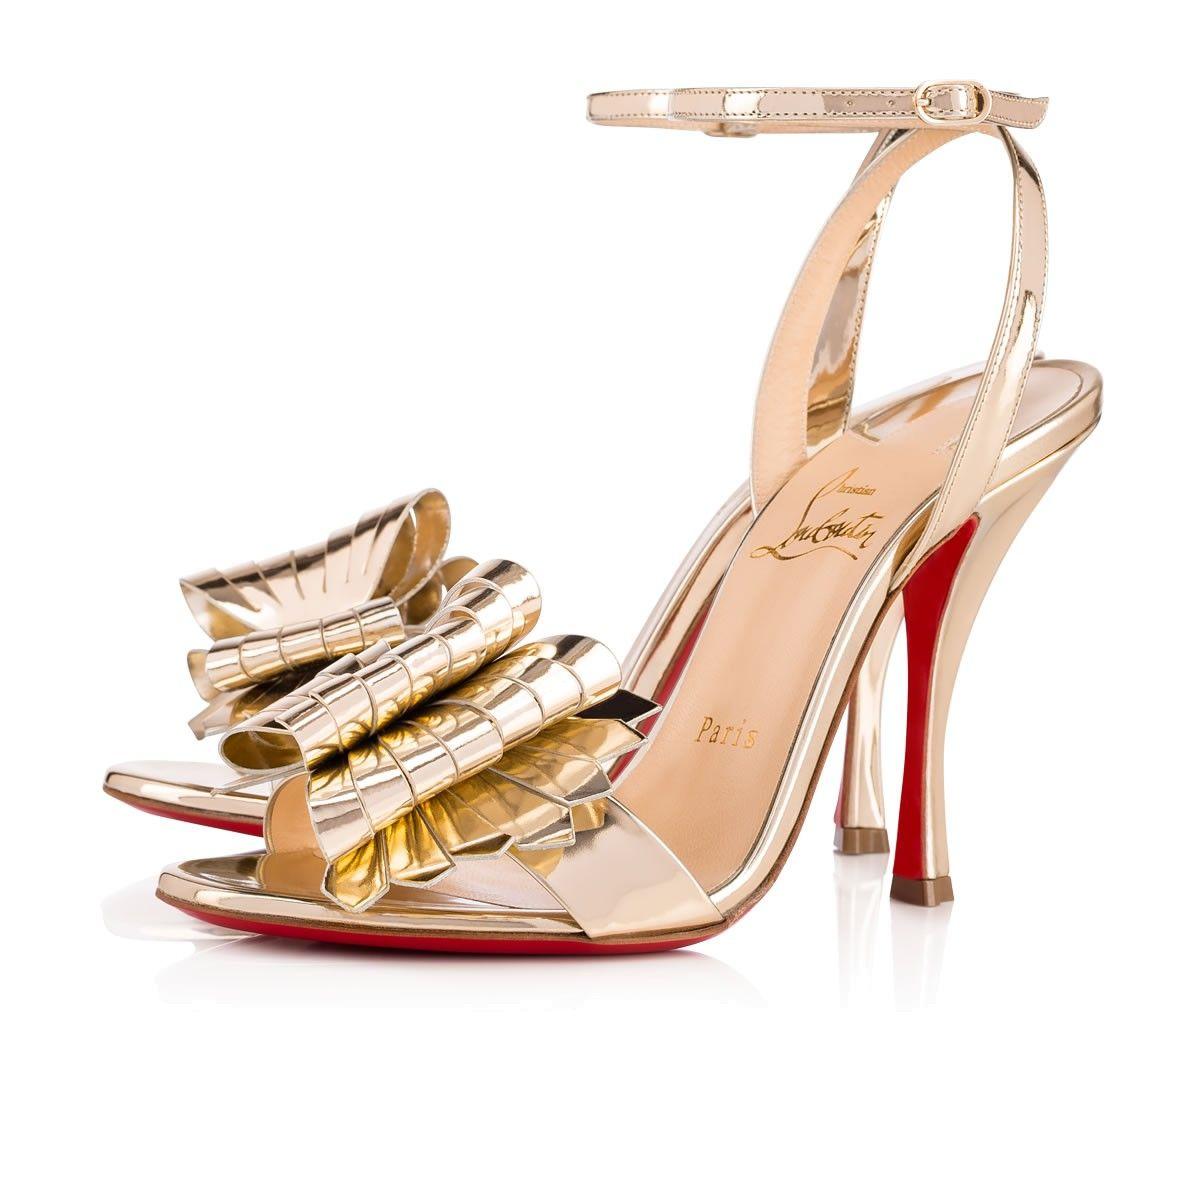 6828a5c2328b Miss Valois 100 Light Gold Specchio Laminato - Women Shoes - Christian  Louboutin